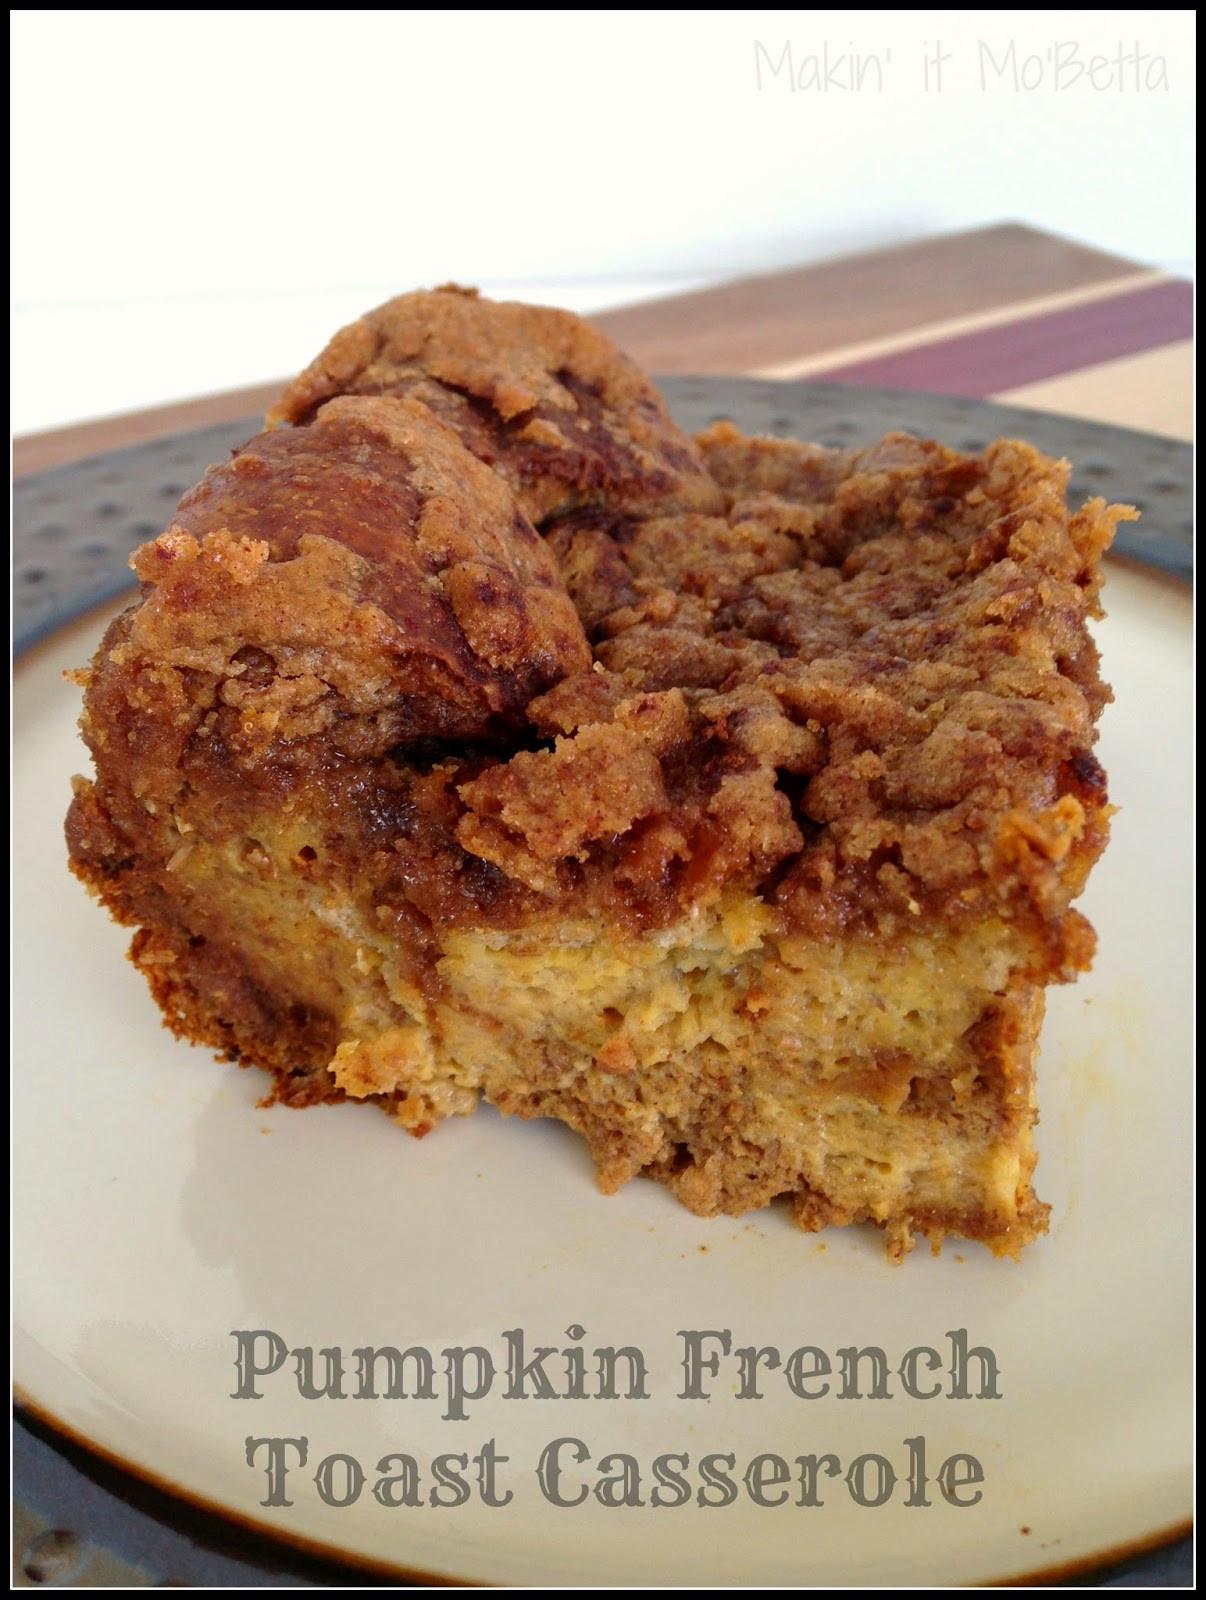 Pumpkin French Toast Casserole  Pumpkin French Toast Bake Recipe — Dishmaps